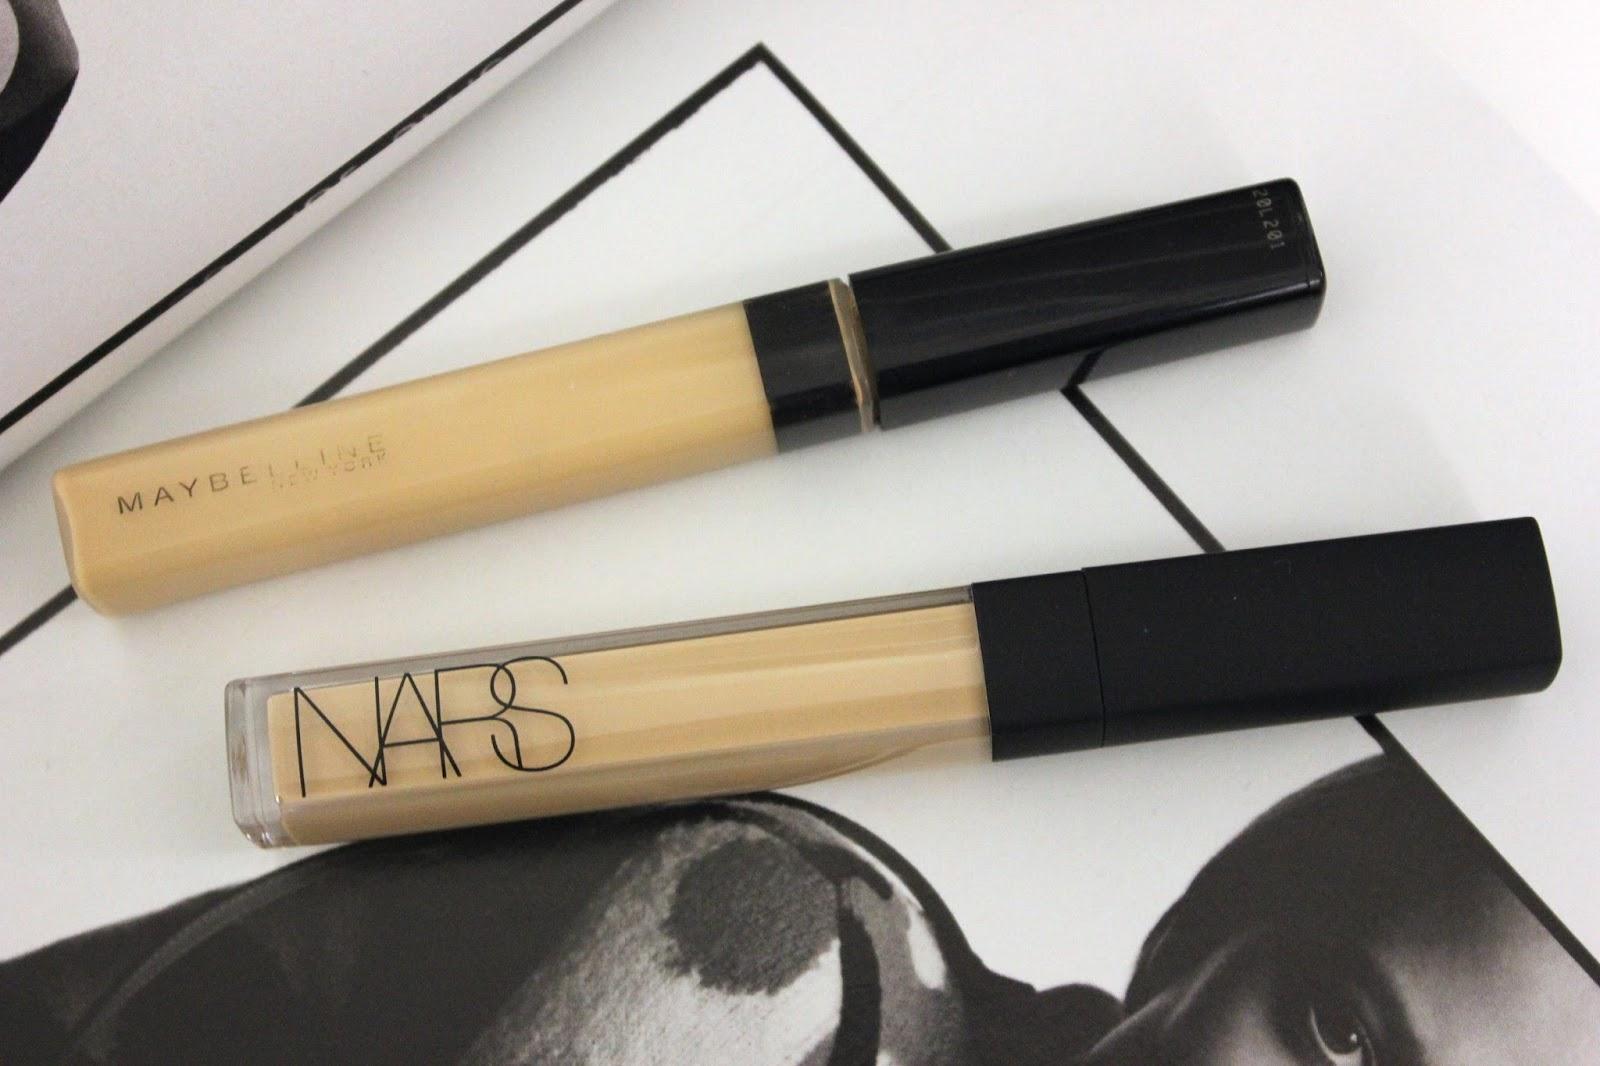 REVIEW + COMPARISON: NARS Radiant Creamy Concealer V.S. Maybelline ...